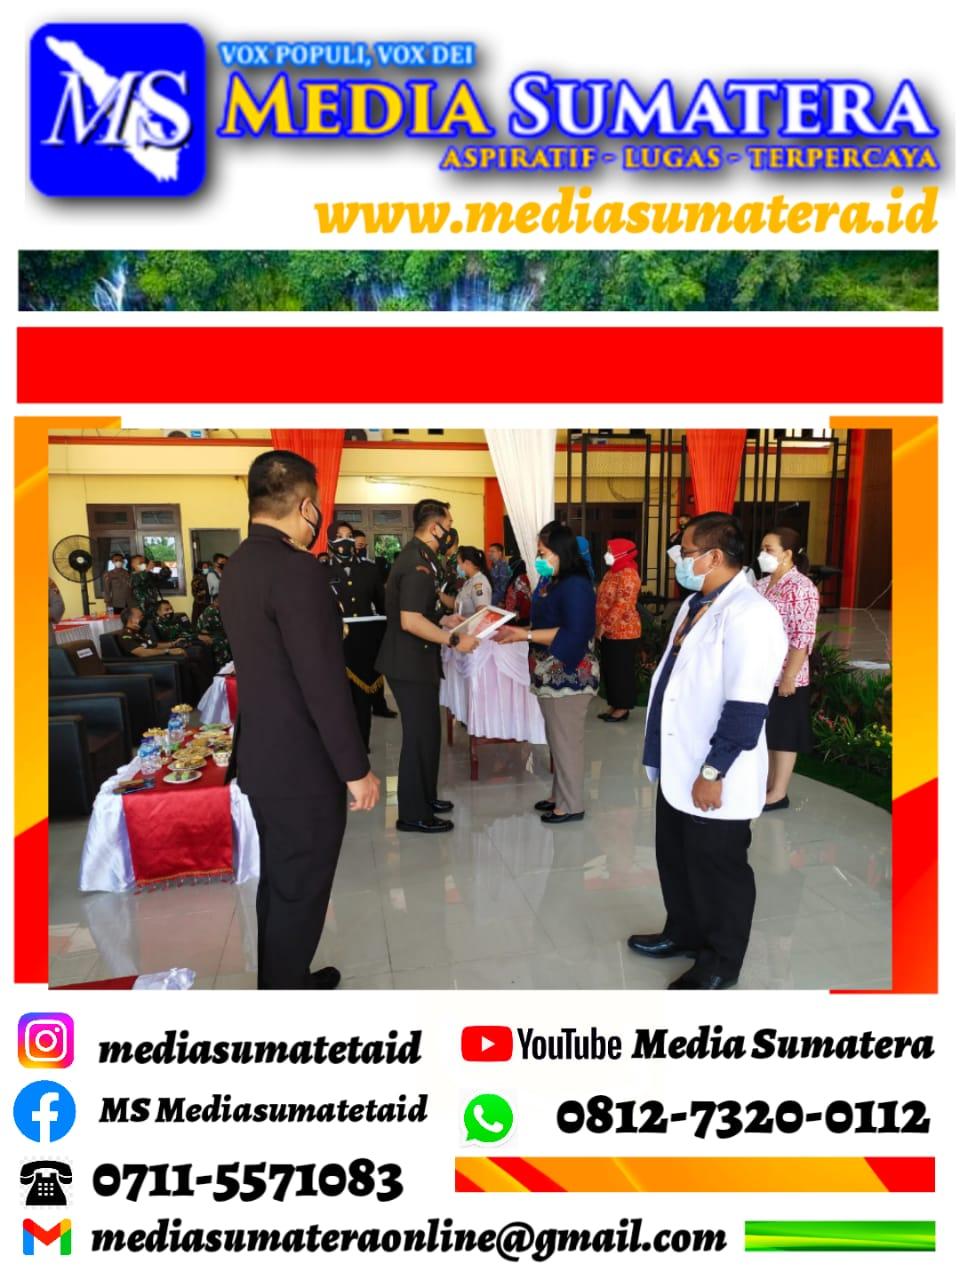 Polresta Deli Serdang Ikuti Upacara HUT Bhayangkara Ke-75 tahun 2021 Secara Virtual